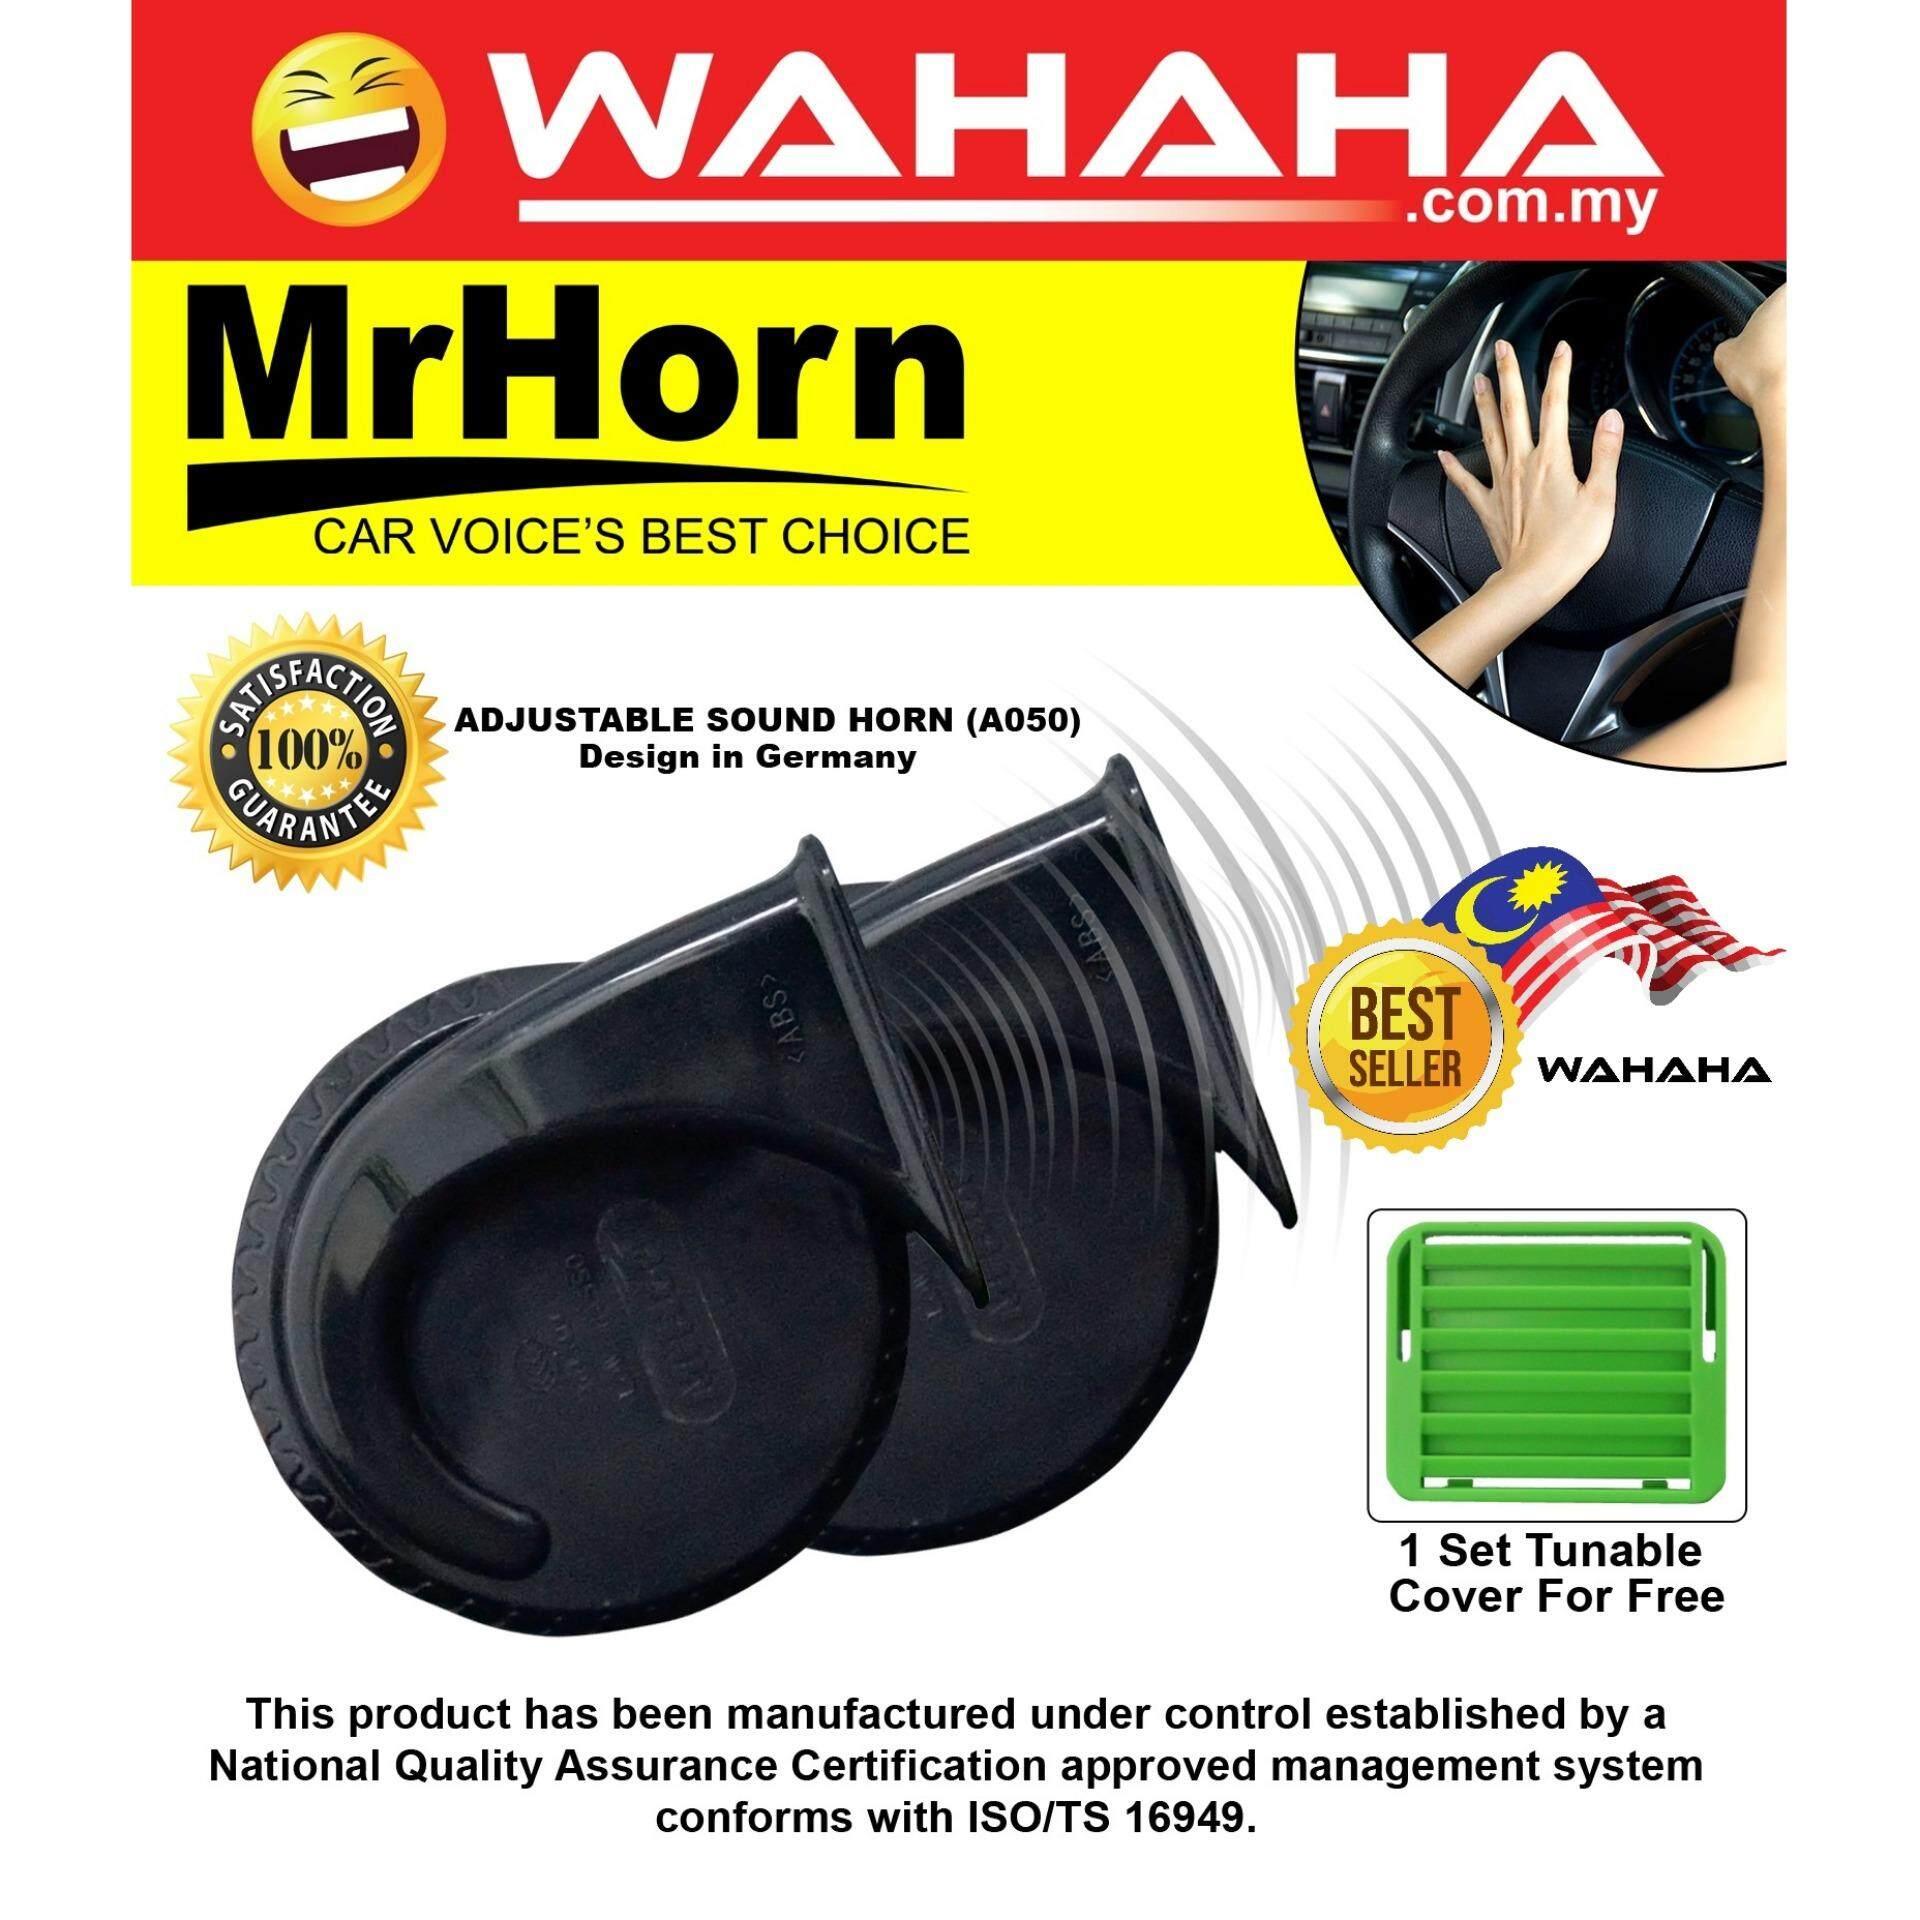 MrHorn A050 Car Horn Adjustable Sound Horn 400Hz/500Hz Free 1 set Tunable cover